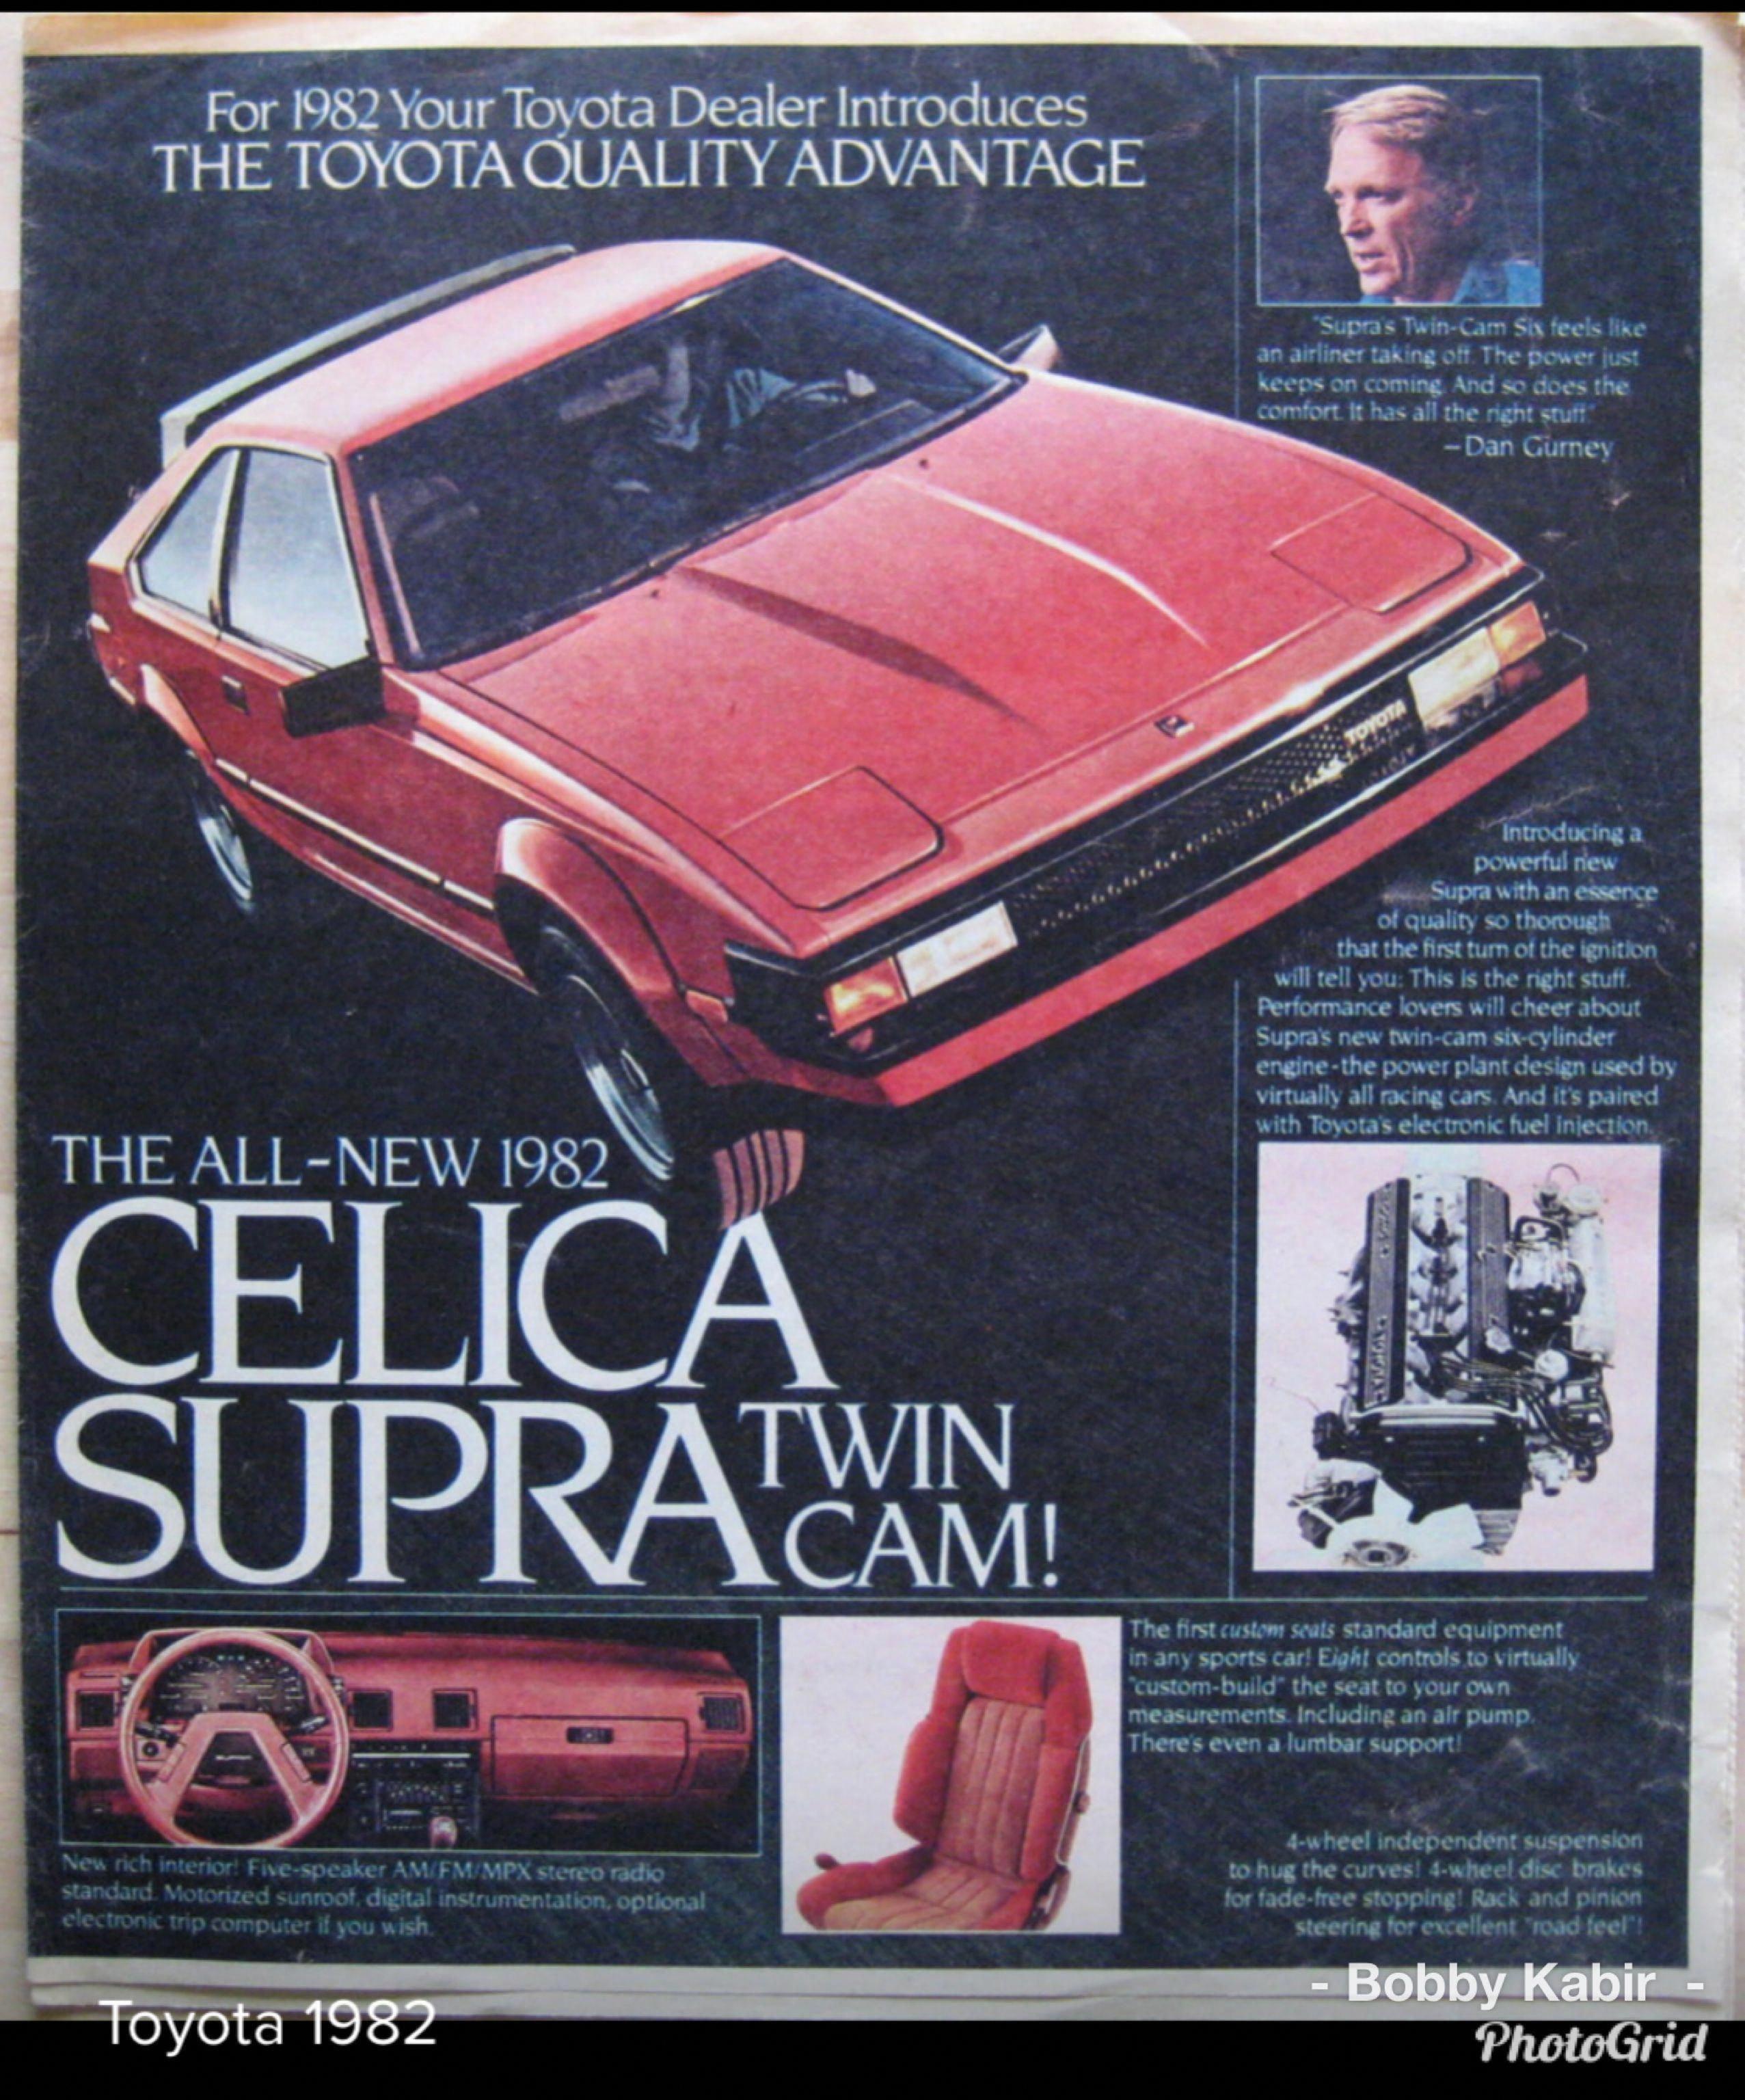 1982 Toyota Celica Supra Ad Toyotaclassiccars Toyota Classic Cars Toyota Celica